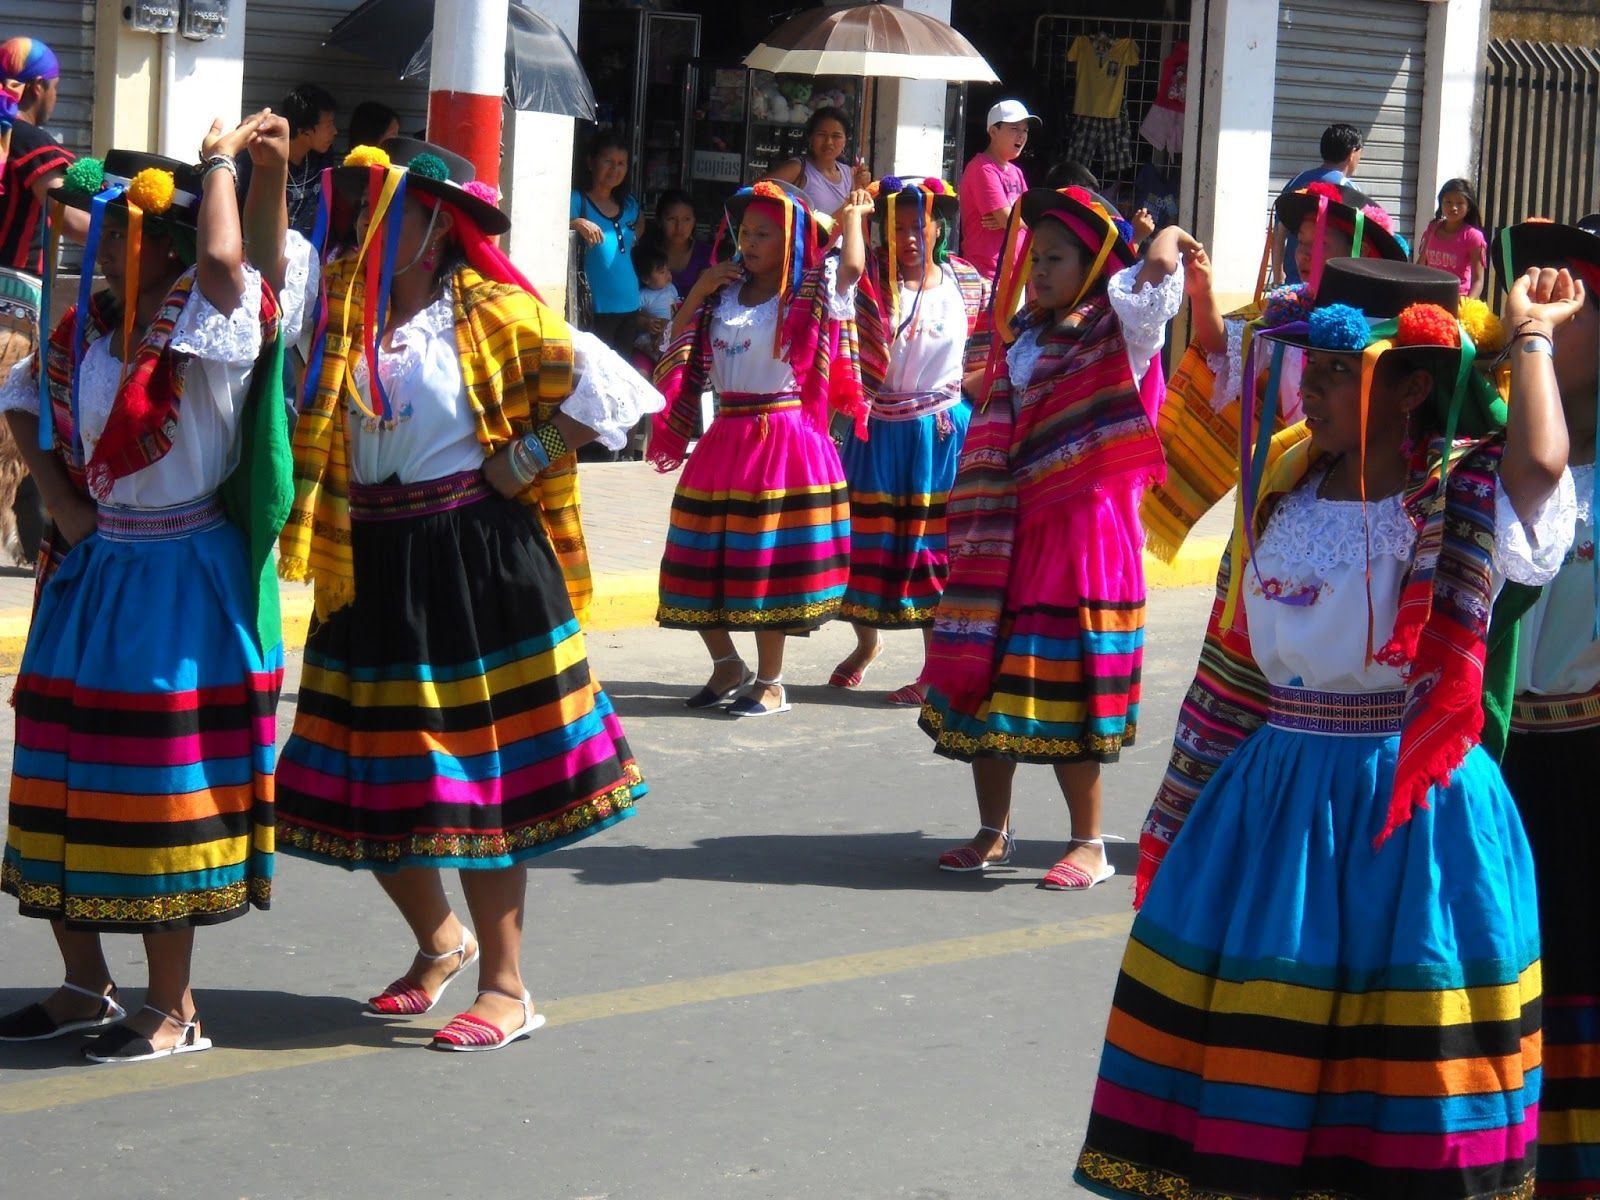 ecuadorian culture - photo #35